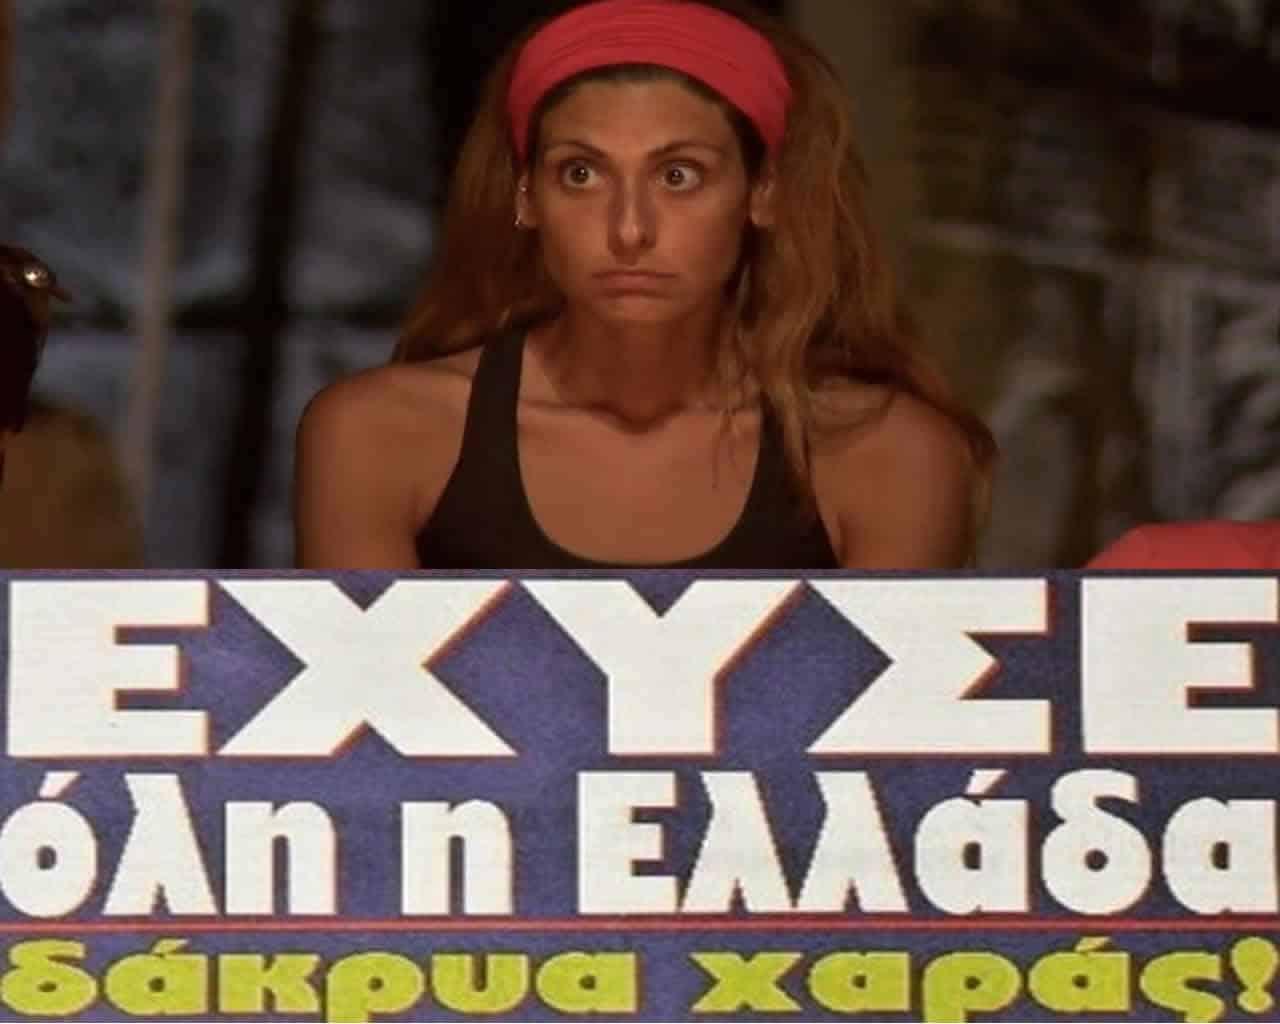 Survivor 4: «Έχυσε όλη η Ελλάδα...δάκρυα χαράς» με την αποχώρηση της Σαλαγκούδη